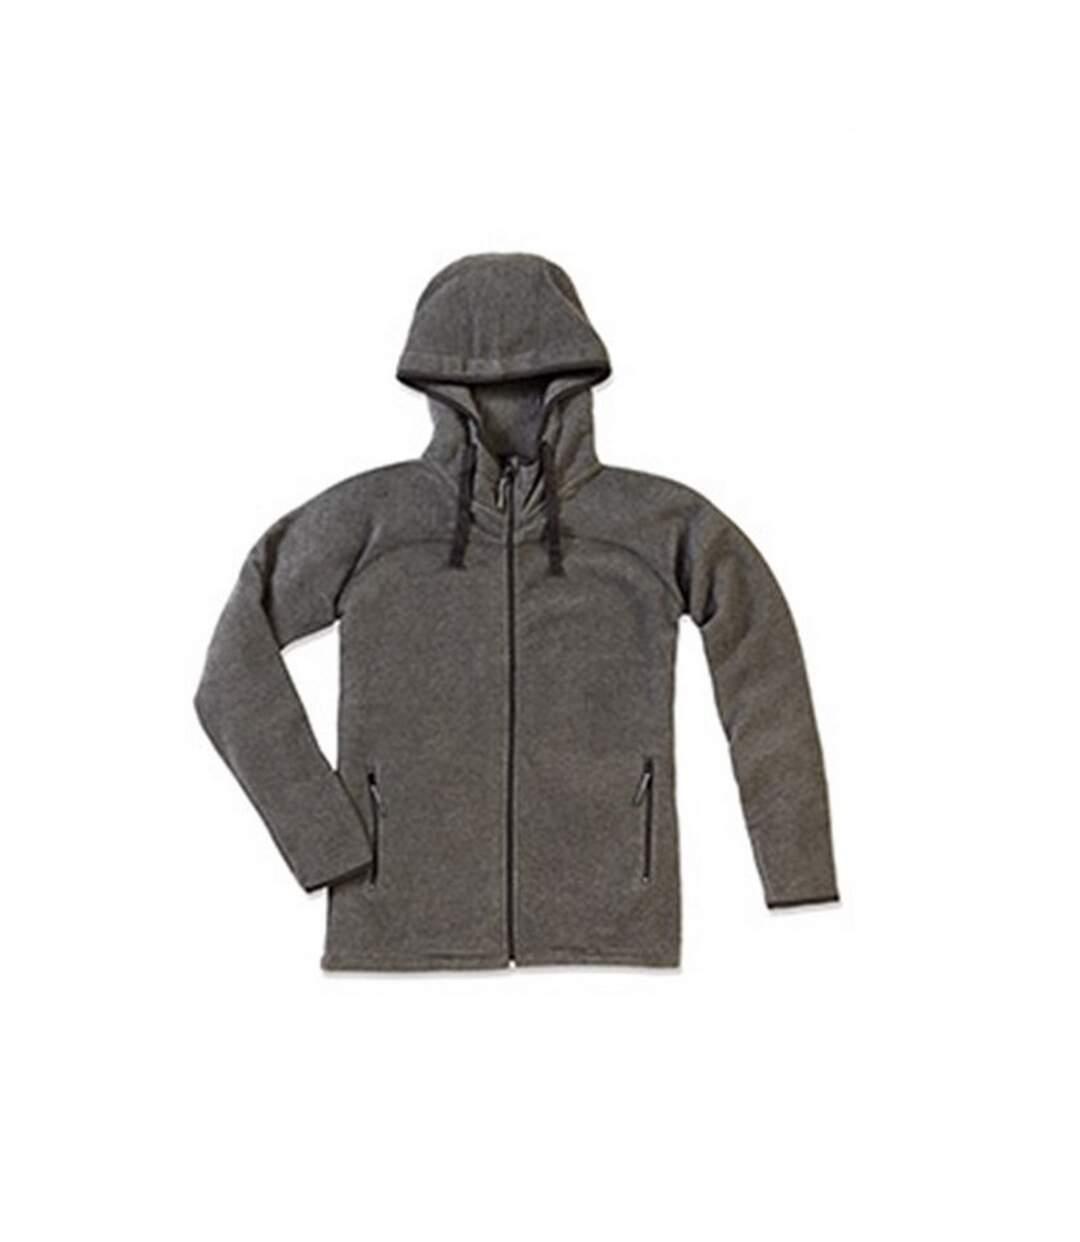 Stedman Mens Active Power Fleece Jacket (Anthra Heather Grey) - UTAB293